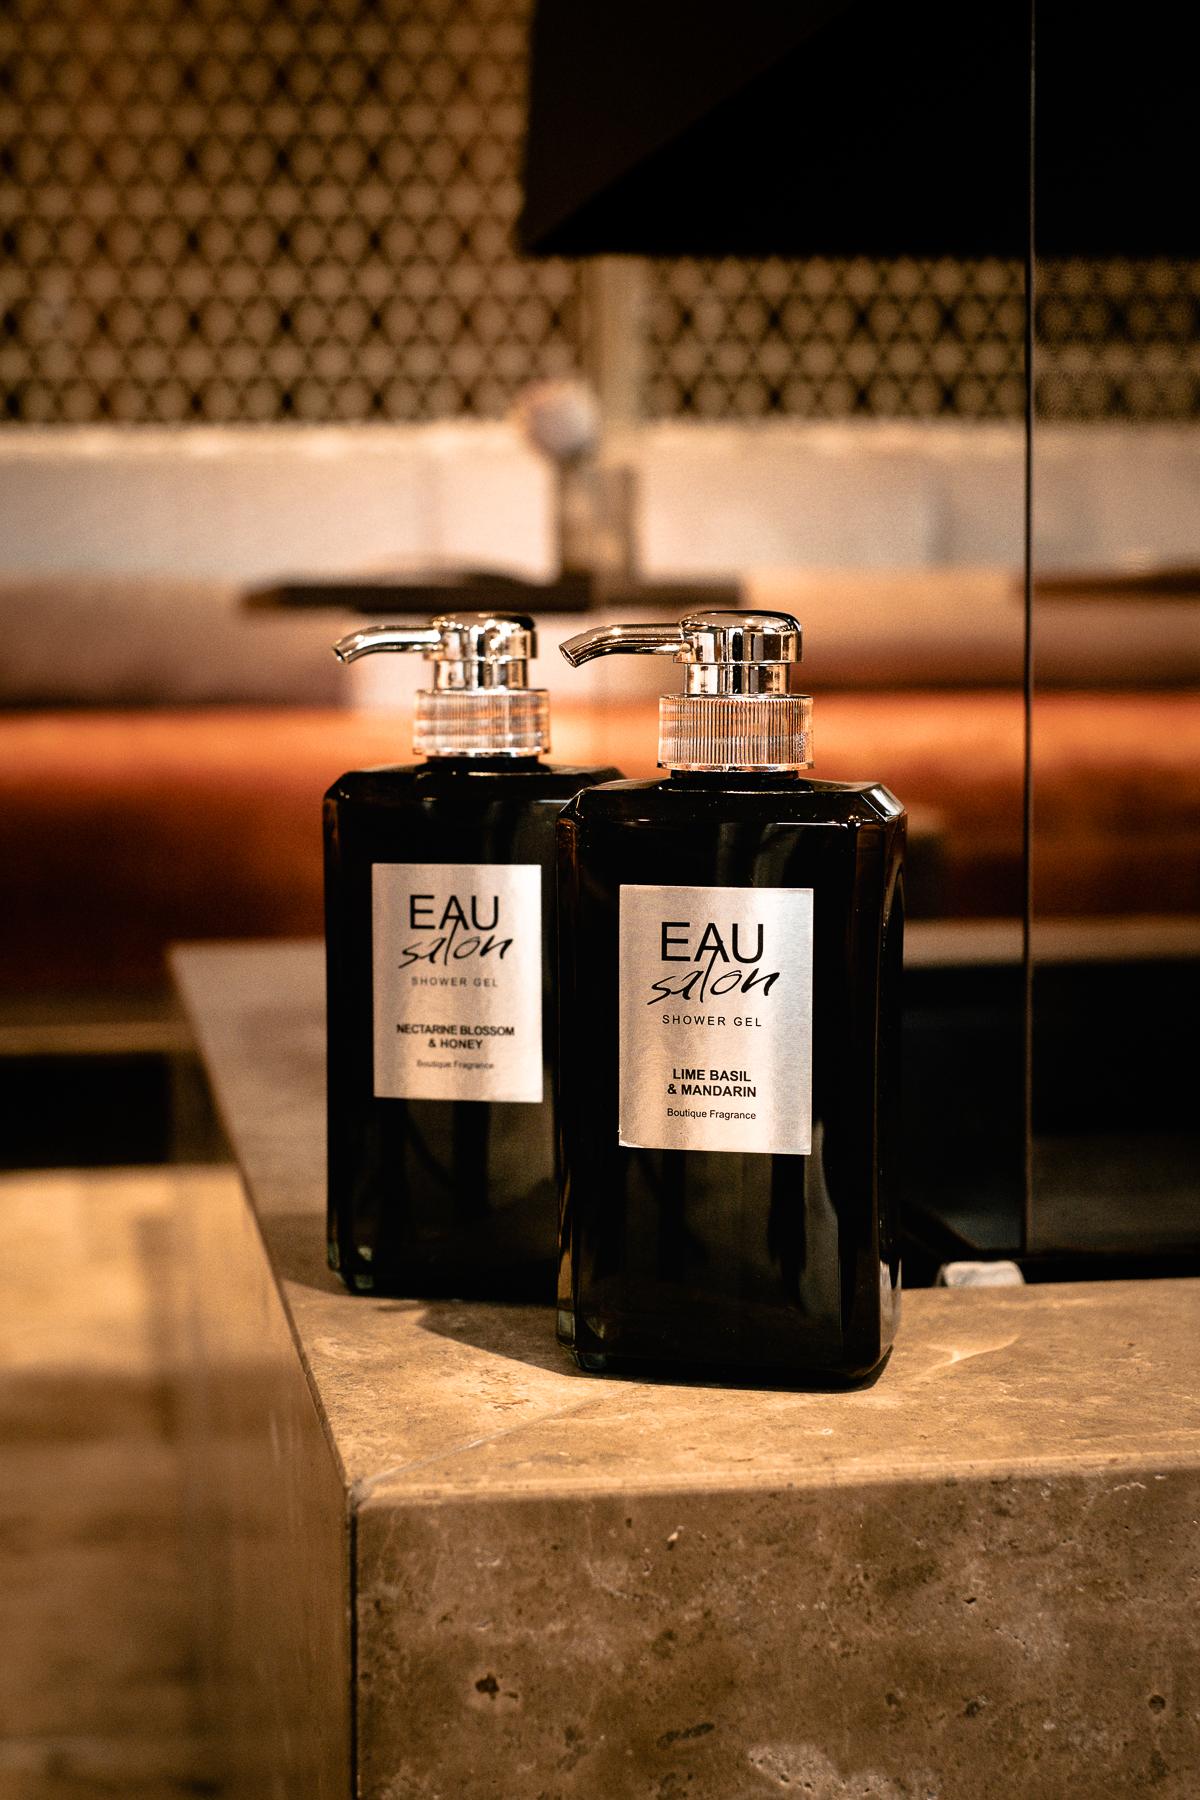 EAU Salon Shower Gel - FujiFilmXT3 - Yes! Please Enjoy-48.jpg